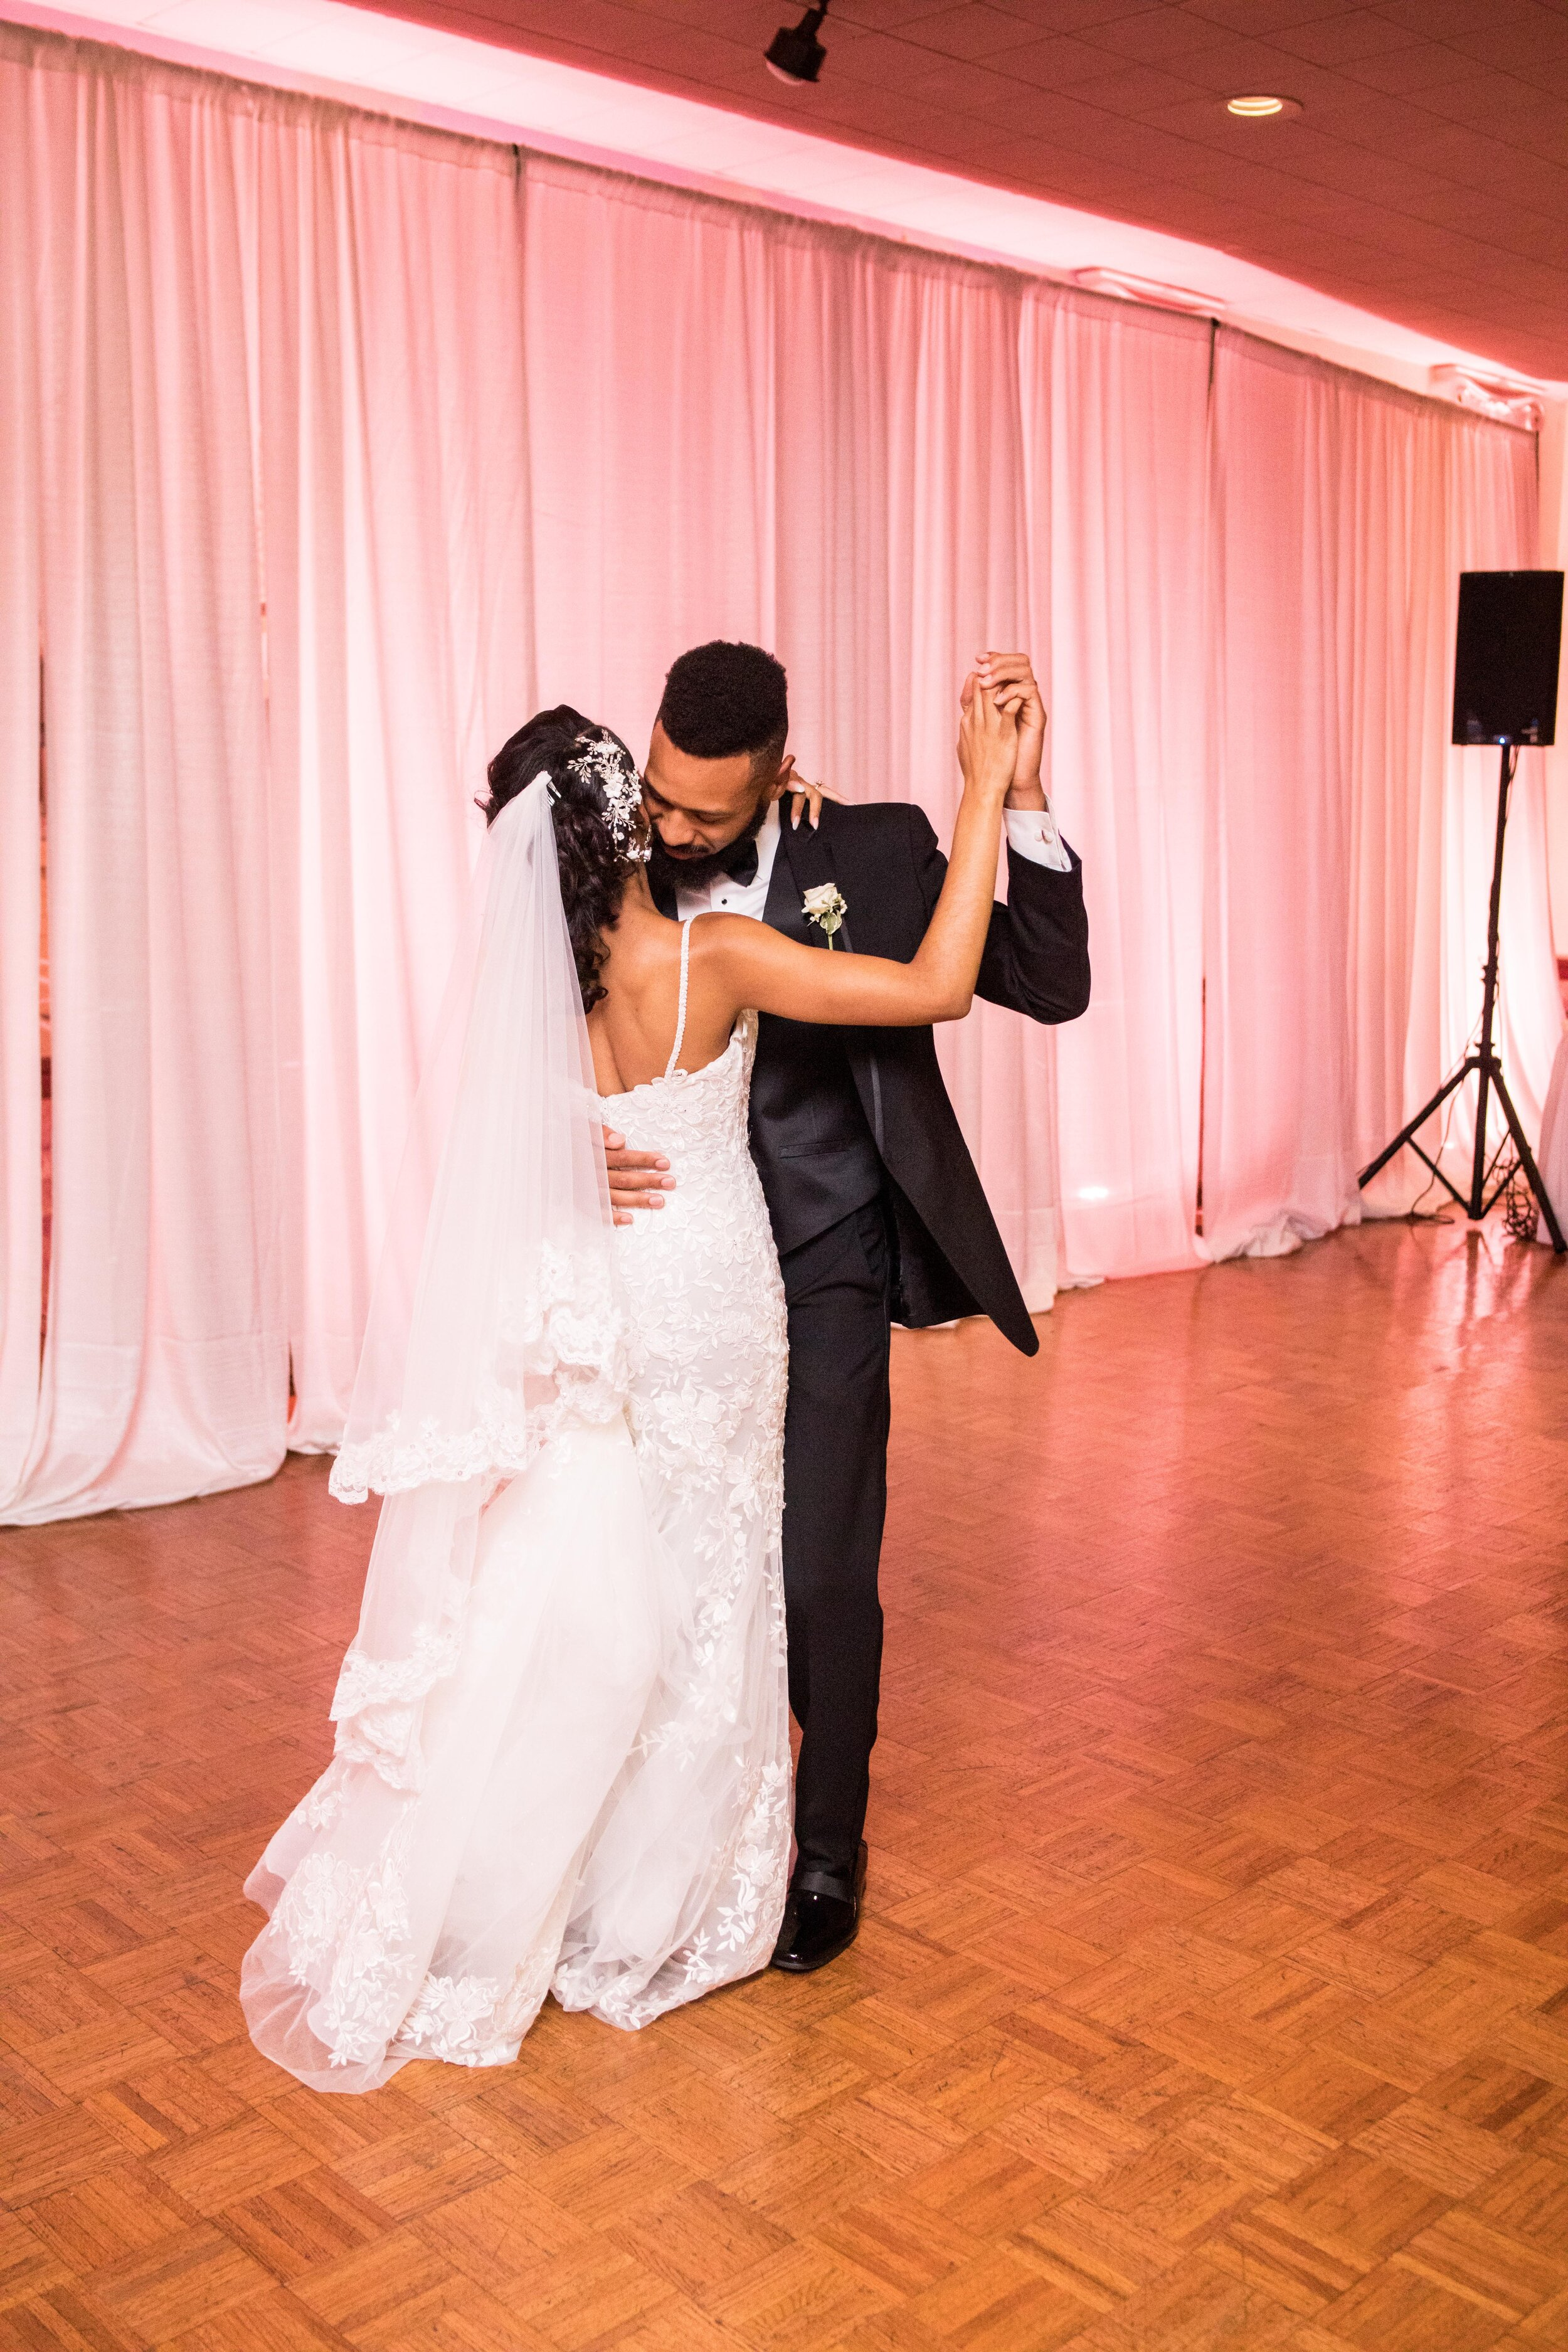 8_3_2019_BONTY_WEDDING-793.jpg